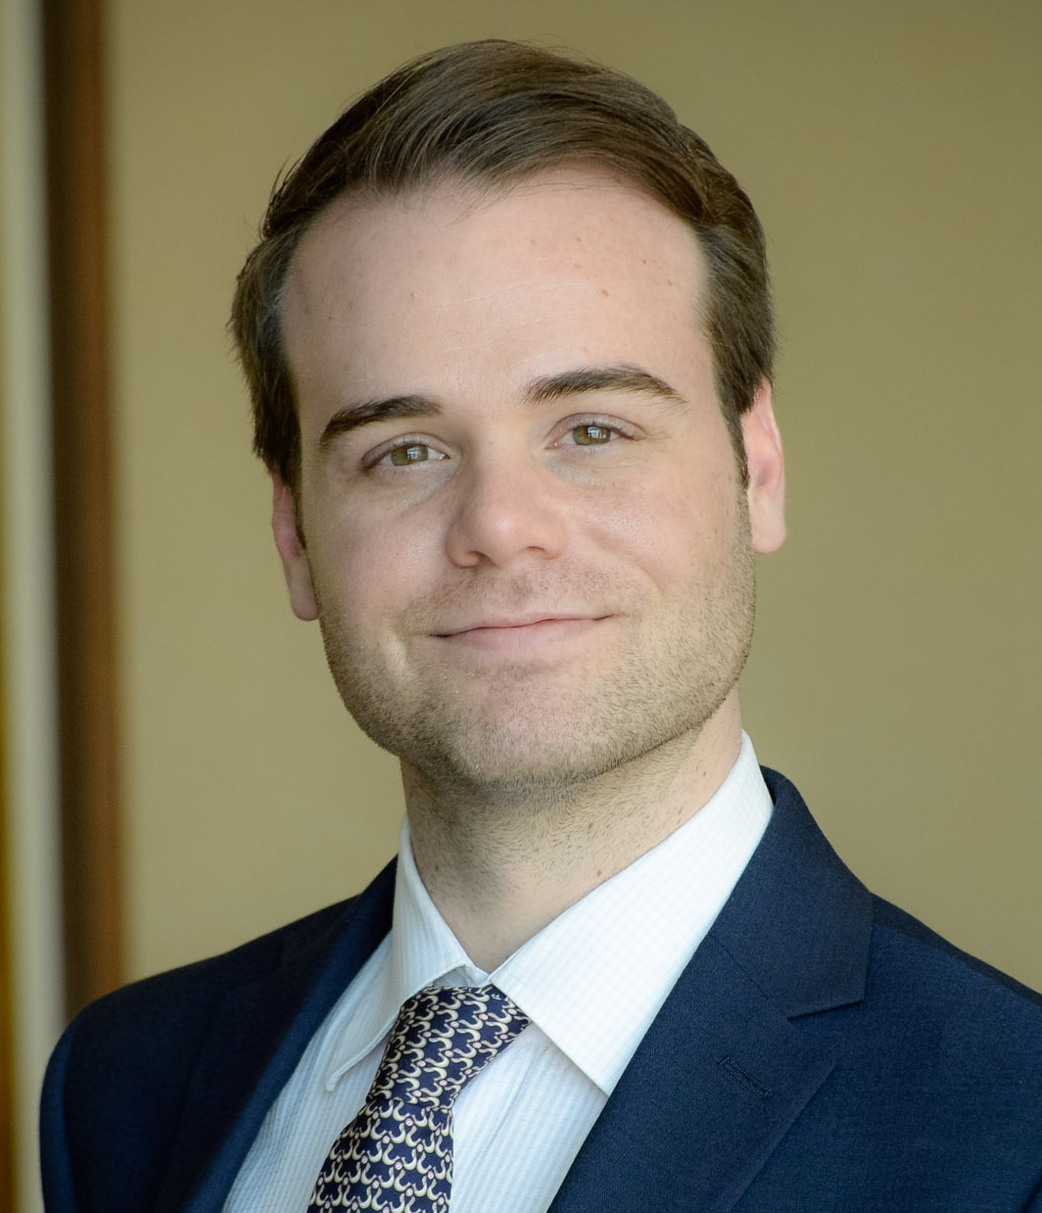 John Osterholt